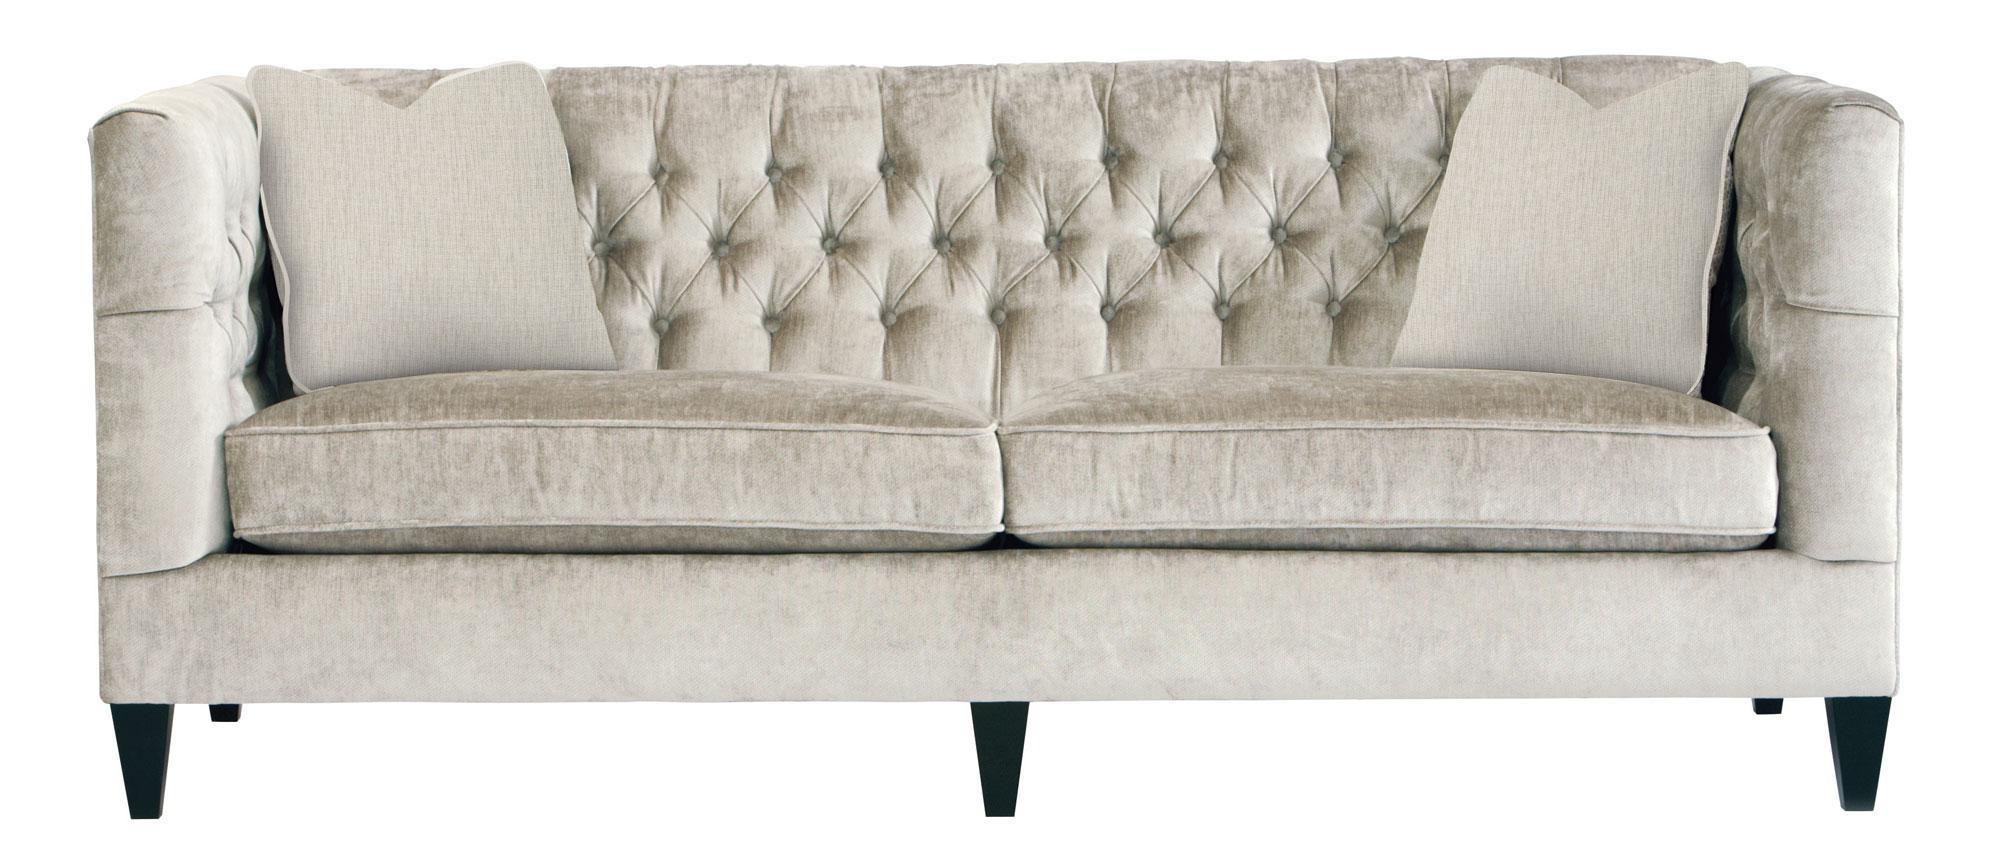 bernhardt furniture sofa natalie habitat 20 best ideas sofas